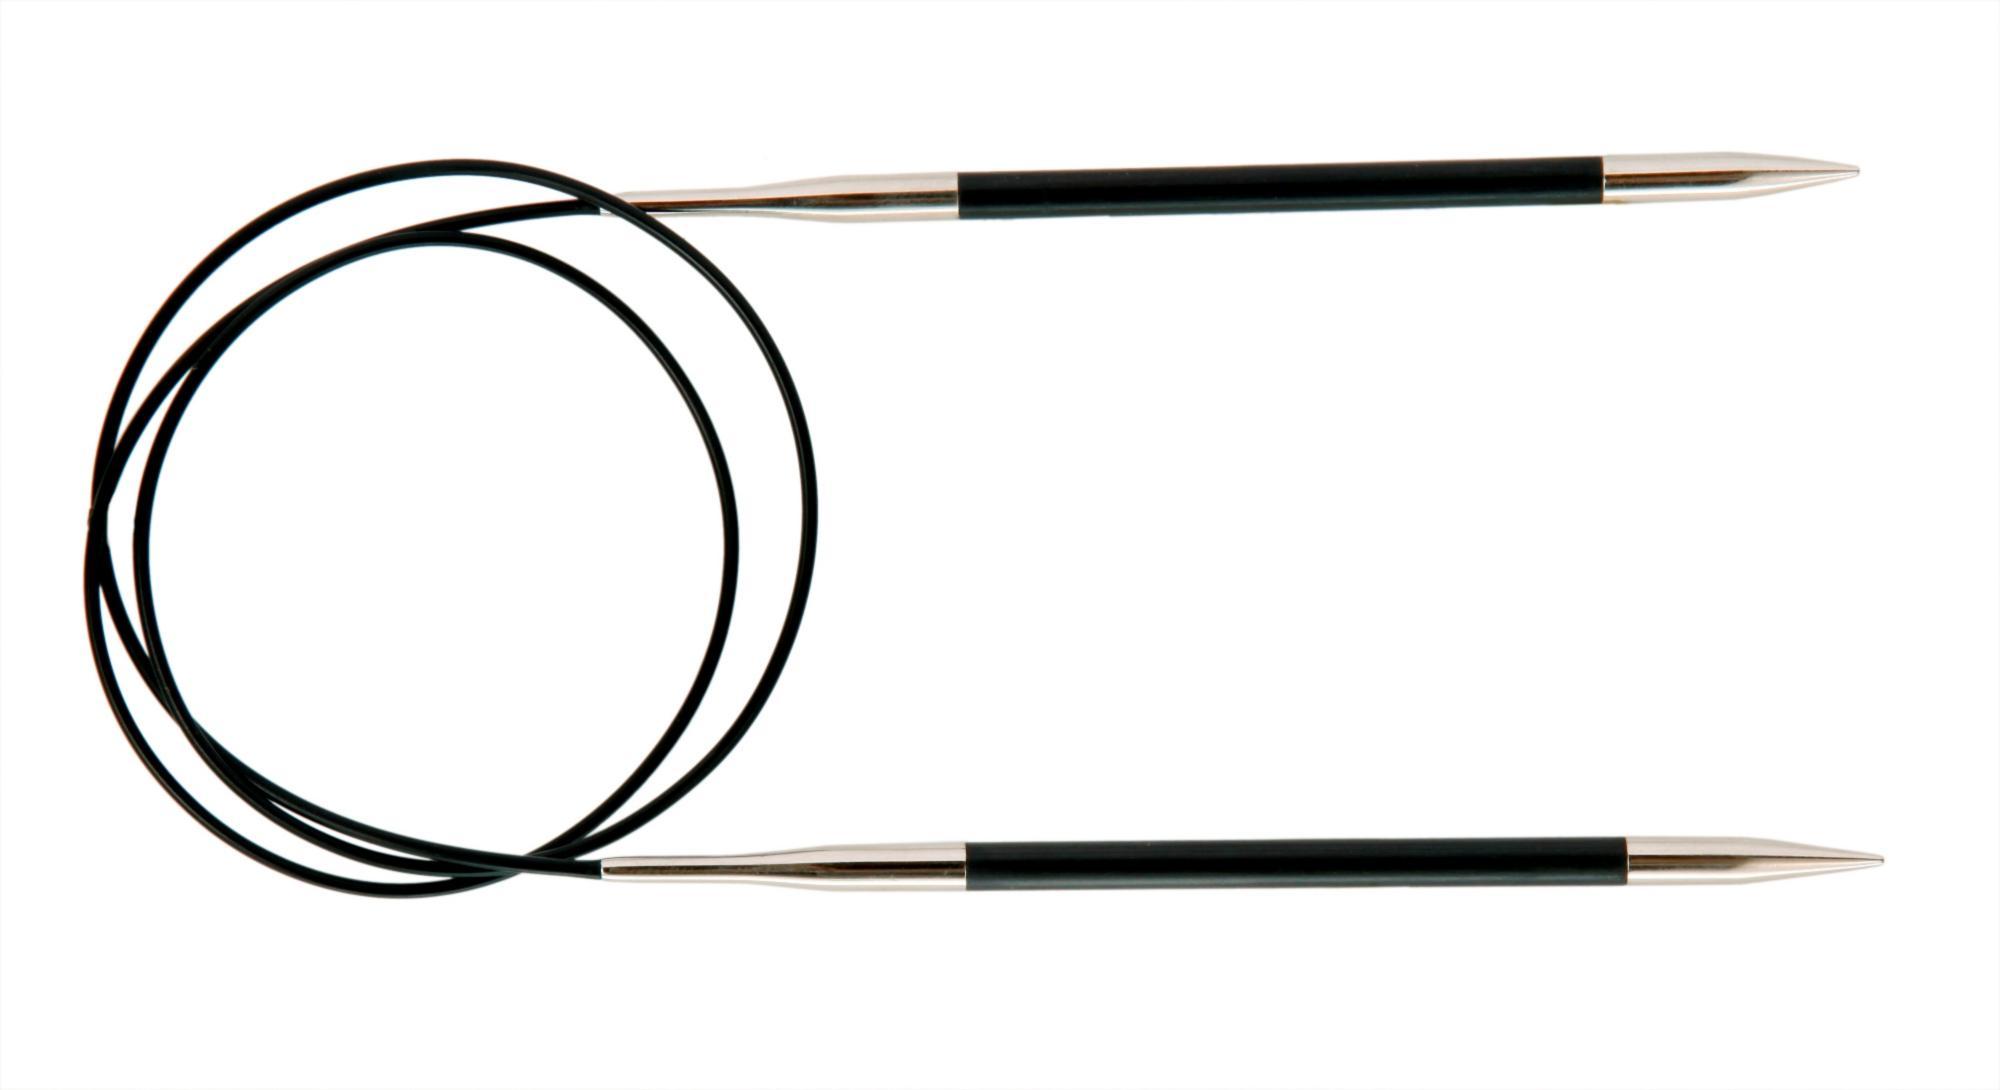 Спицы круговые 100 см Karbonz KnitPro, 41211, 5.00 мм